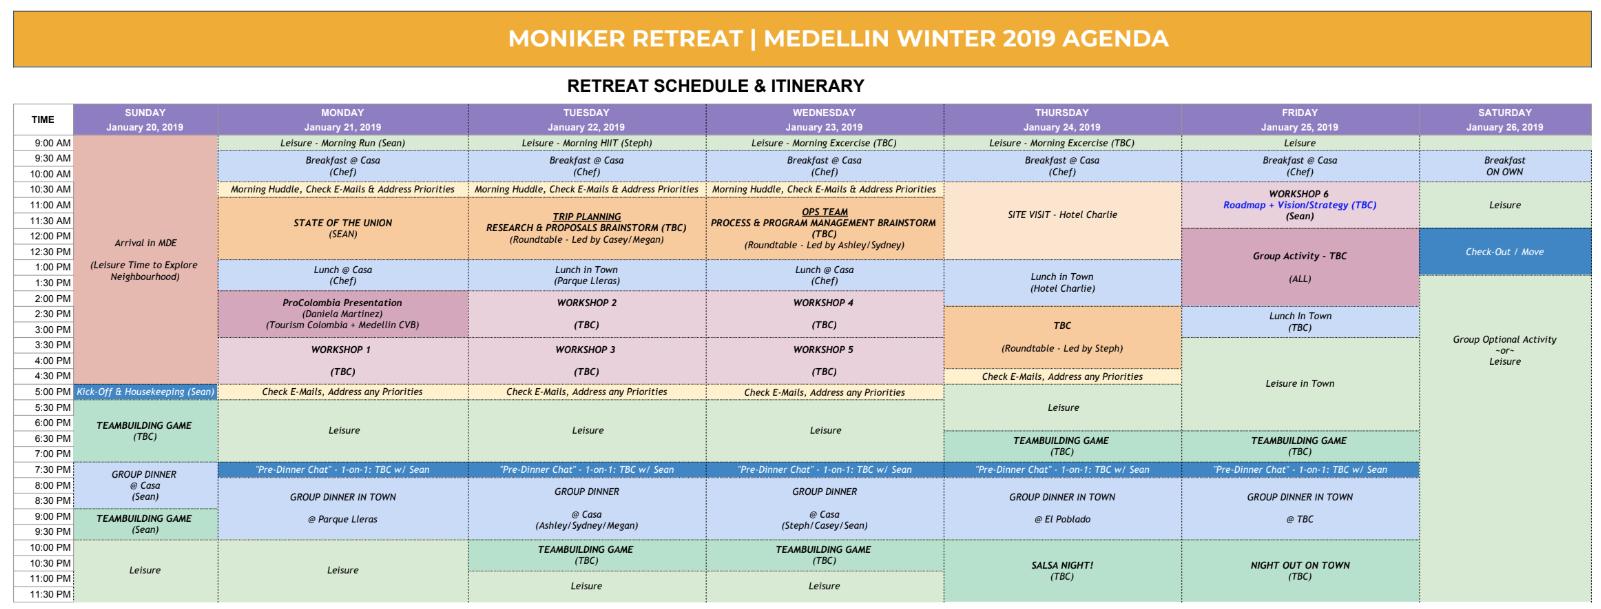 Company retreat schedule